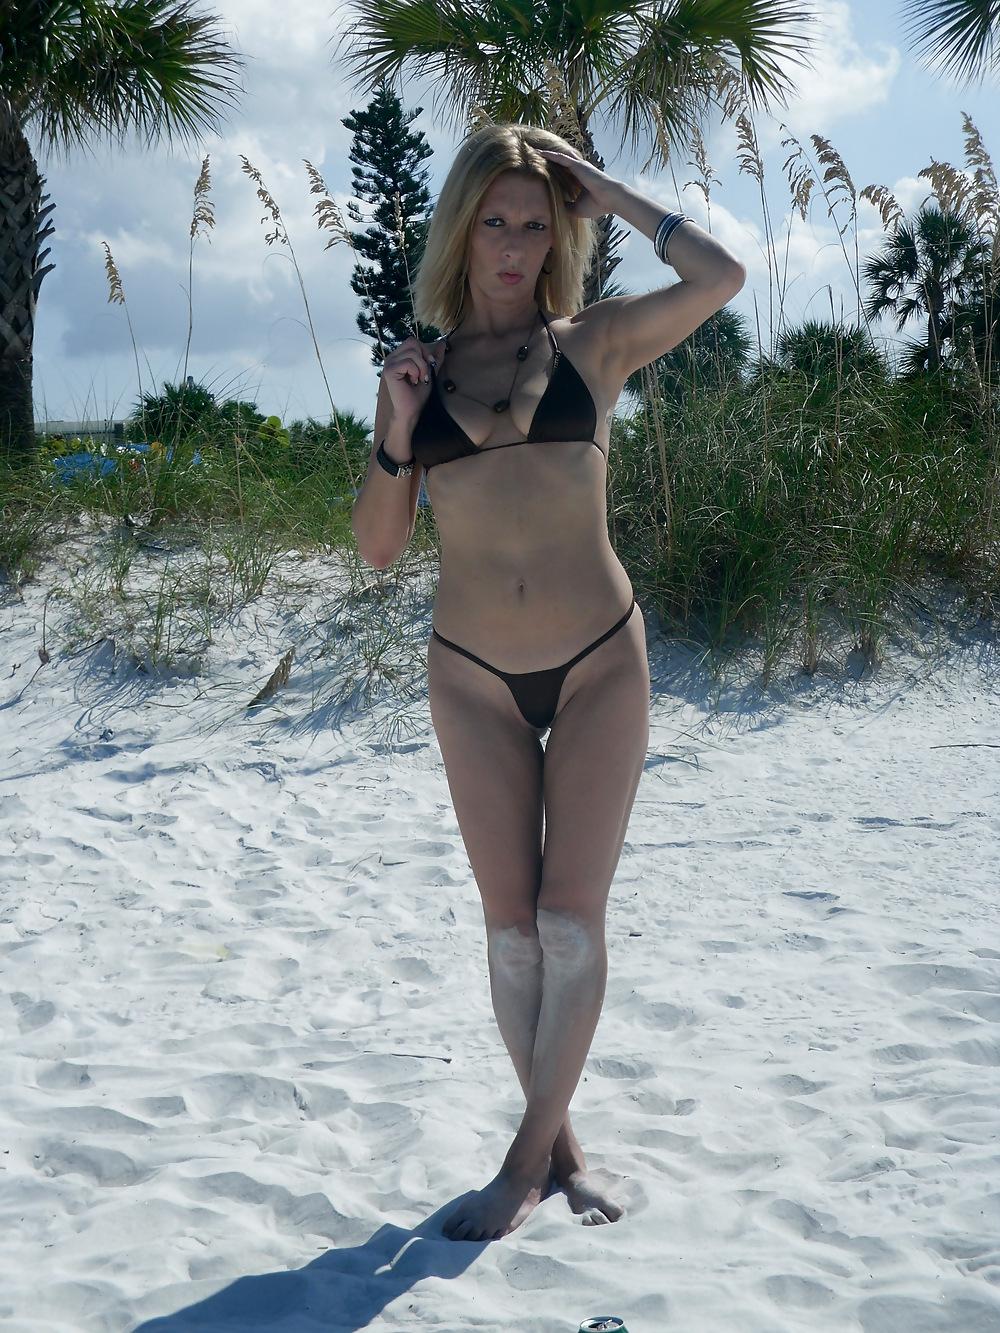 Amateur nude beach photo